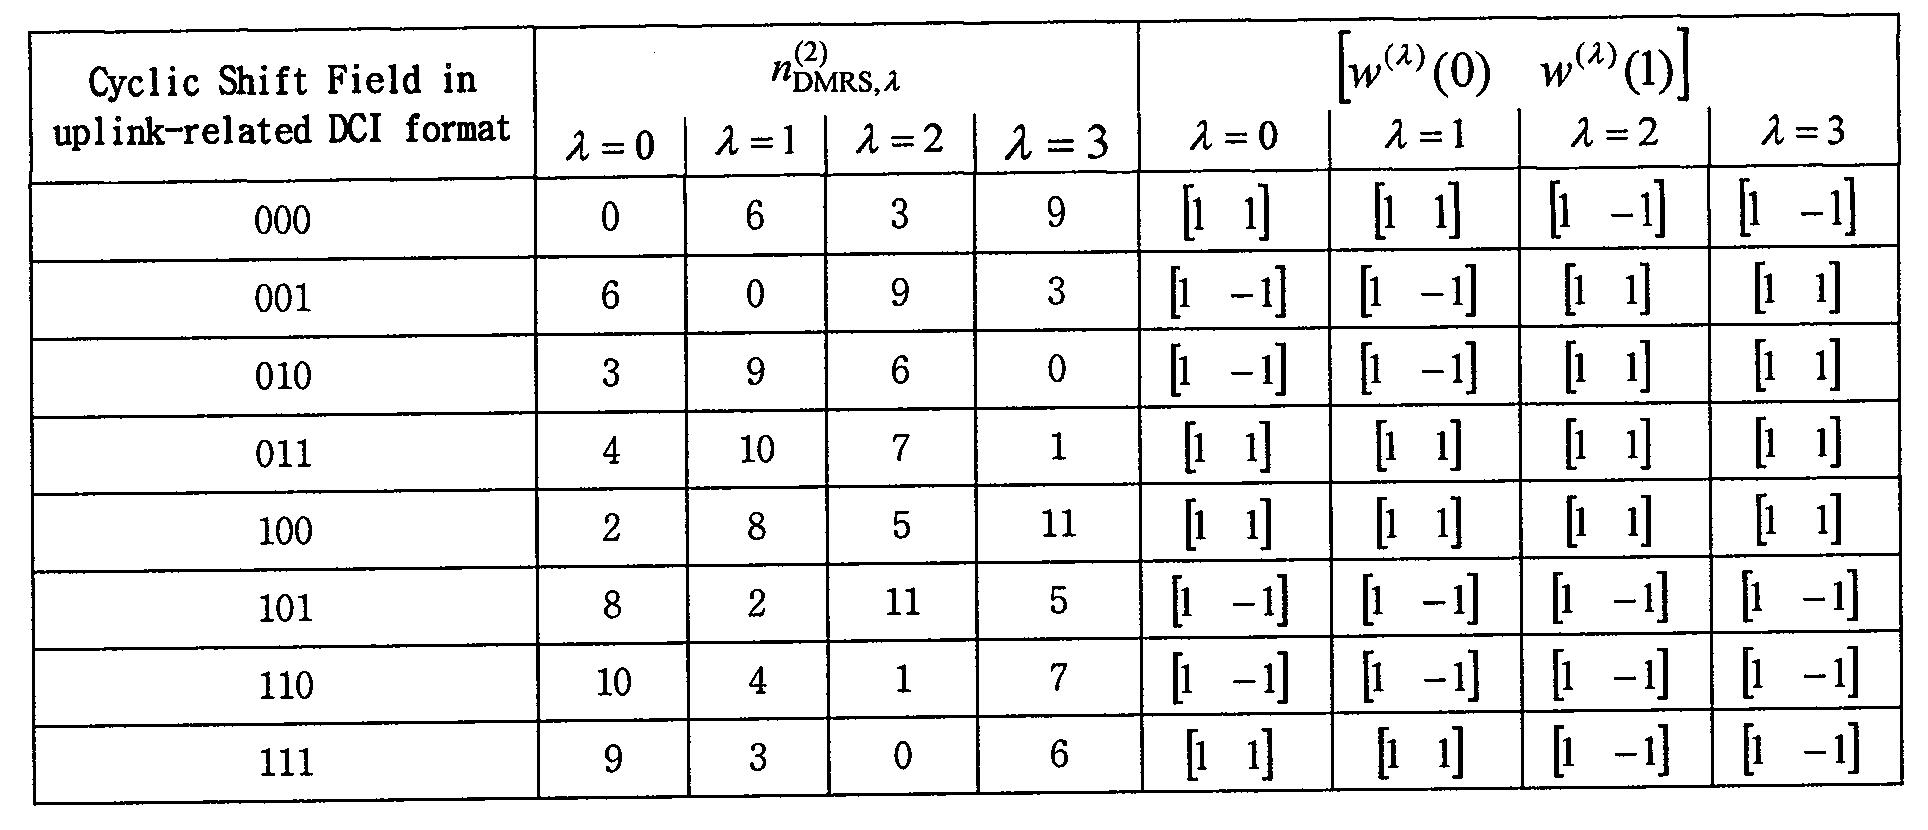 Figure 112011500951185-pat00134